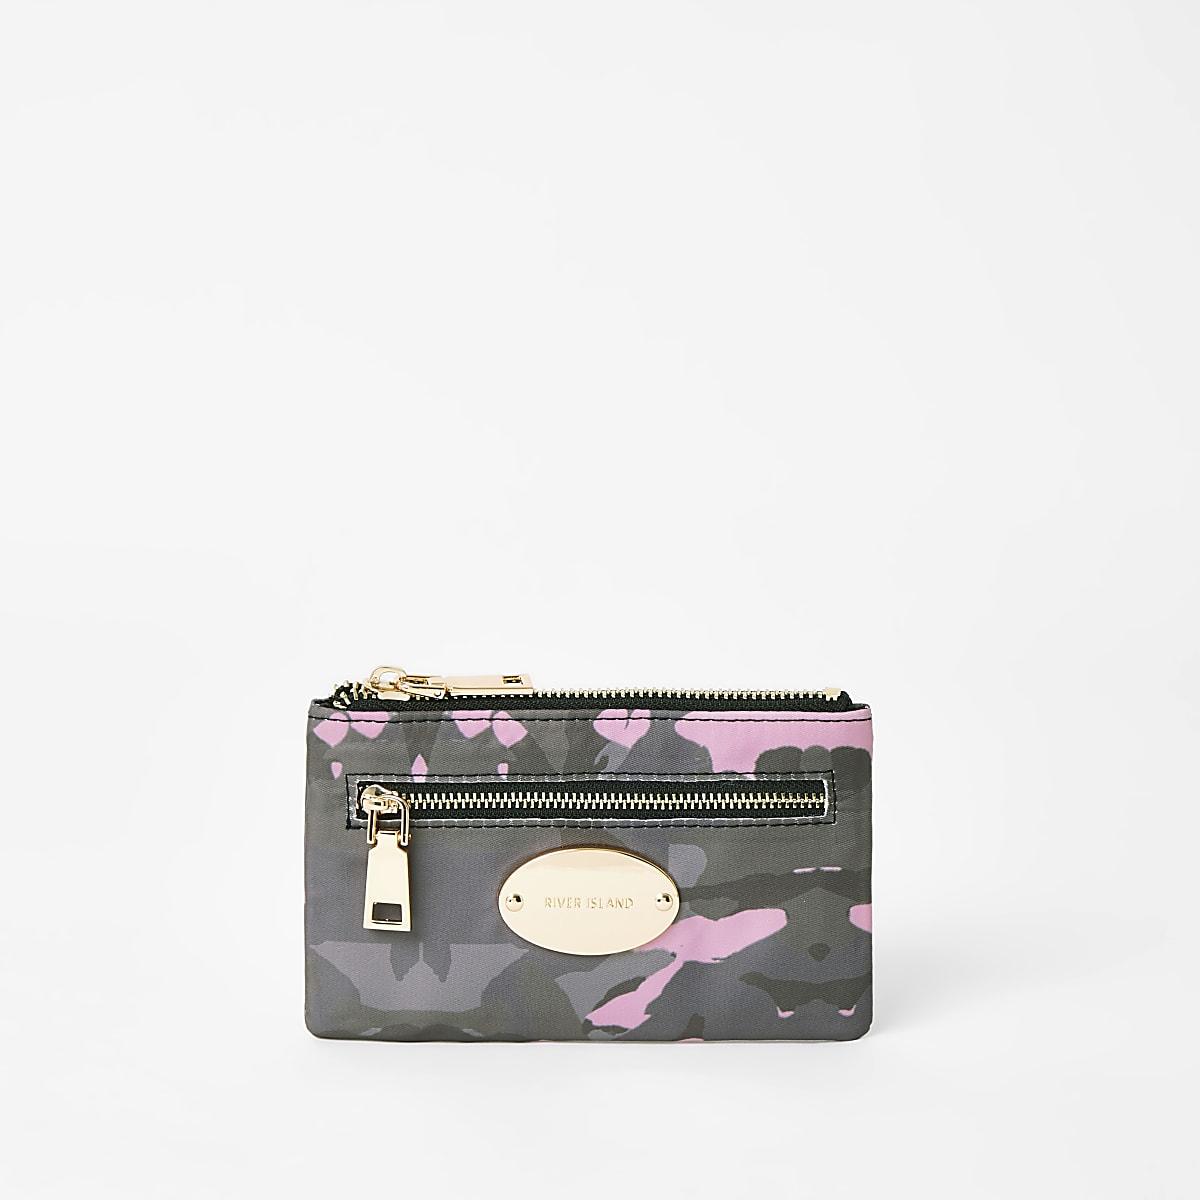 Khaki camo mini oval RI branding purse